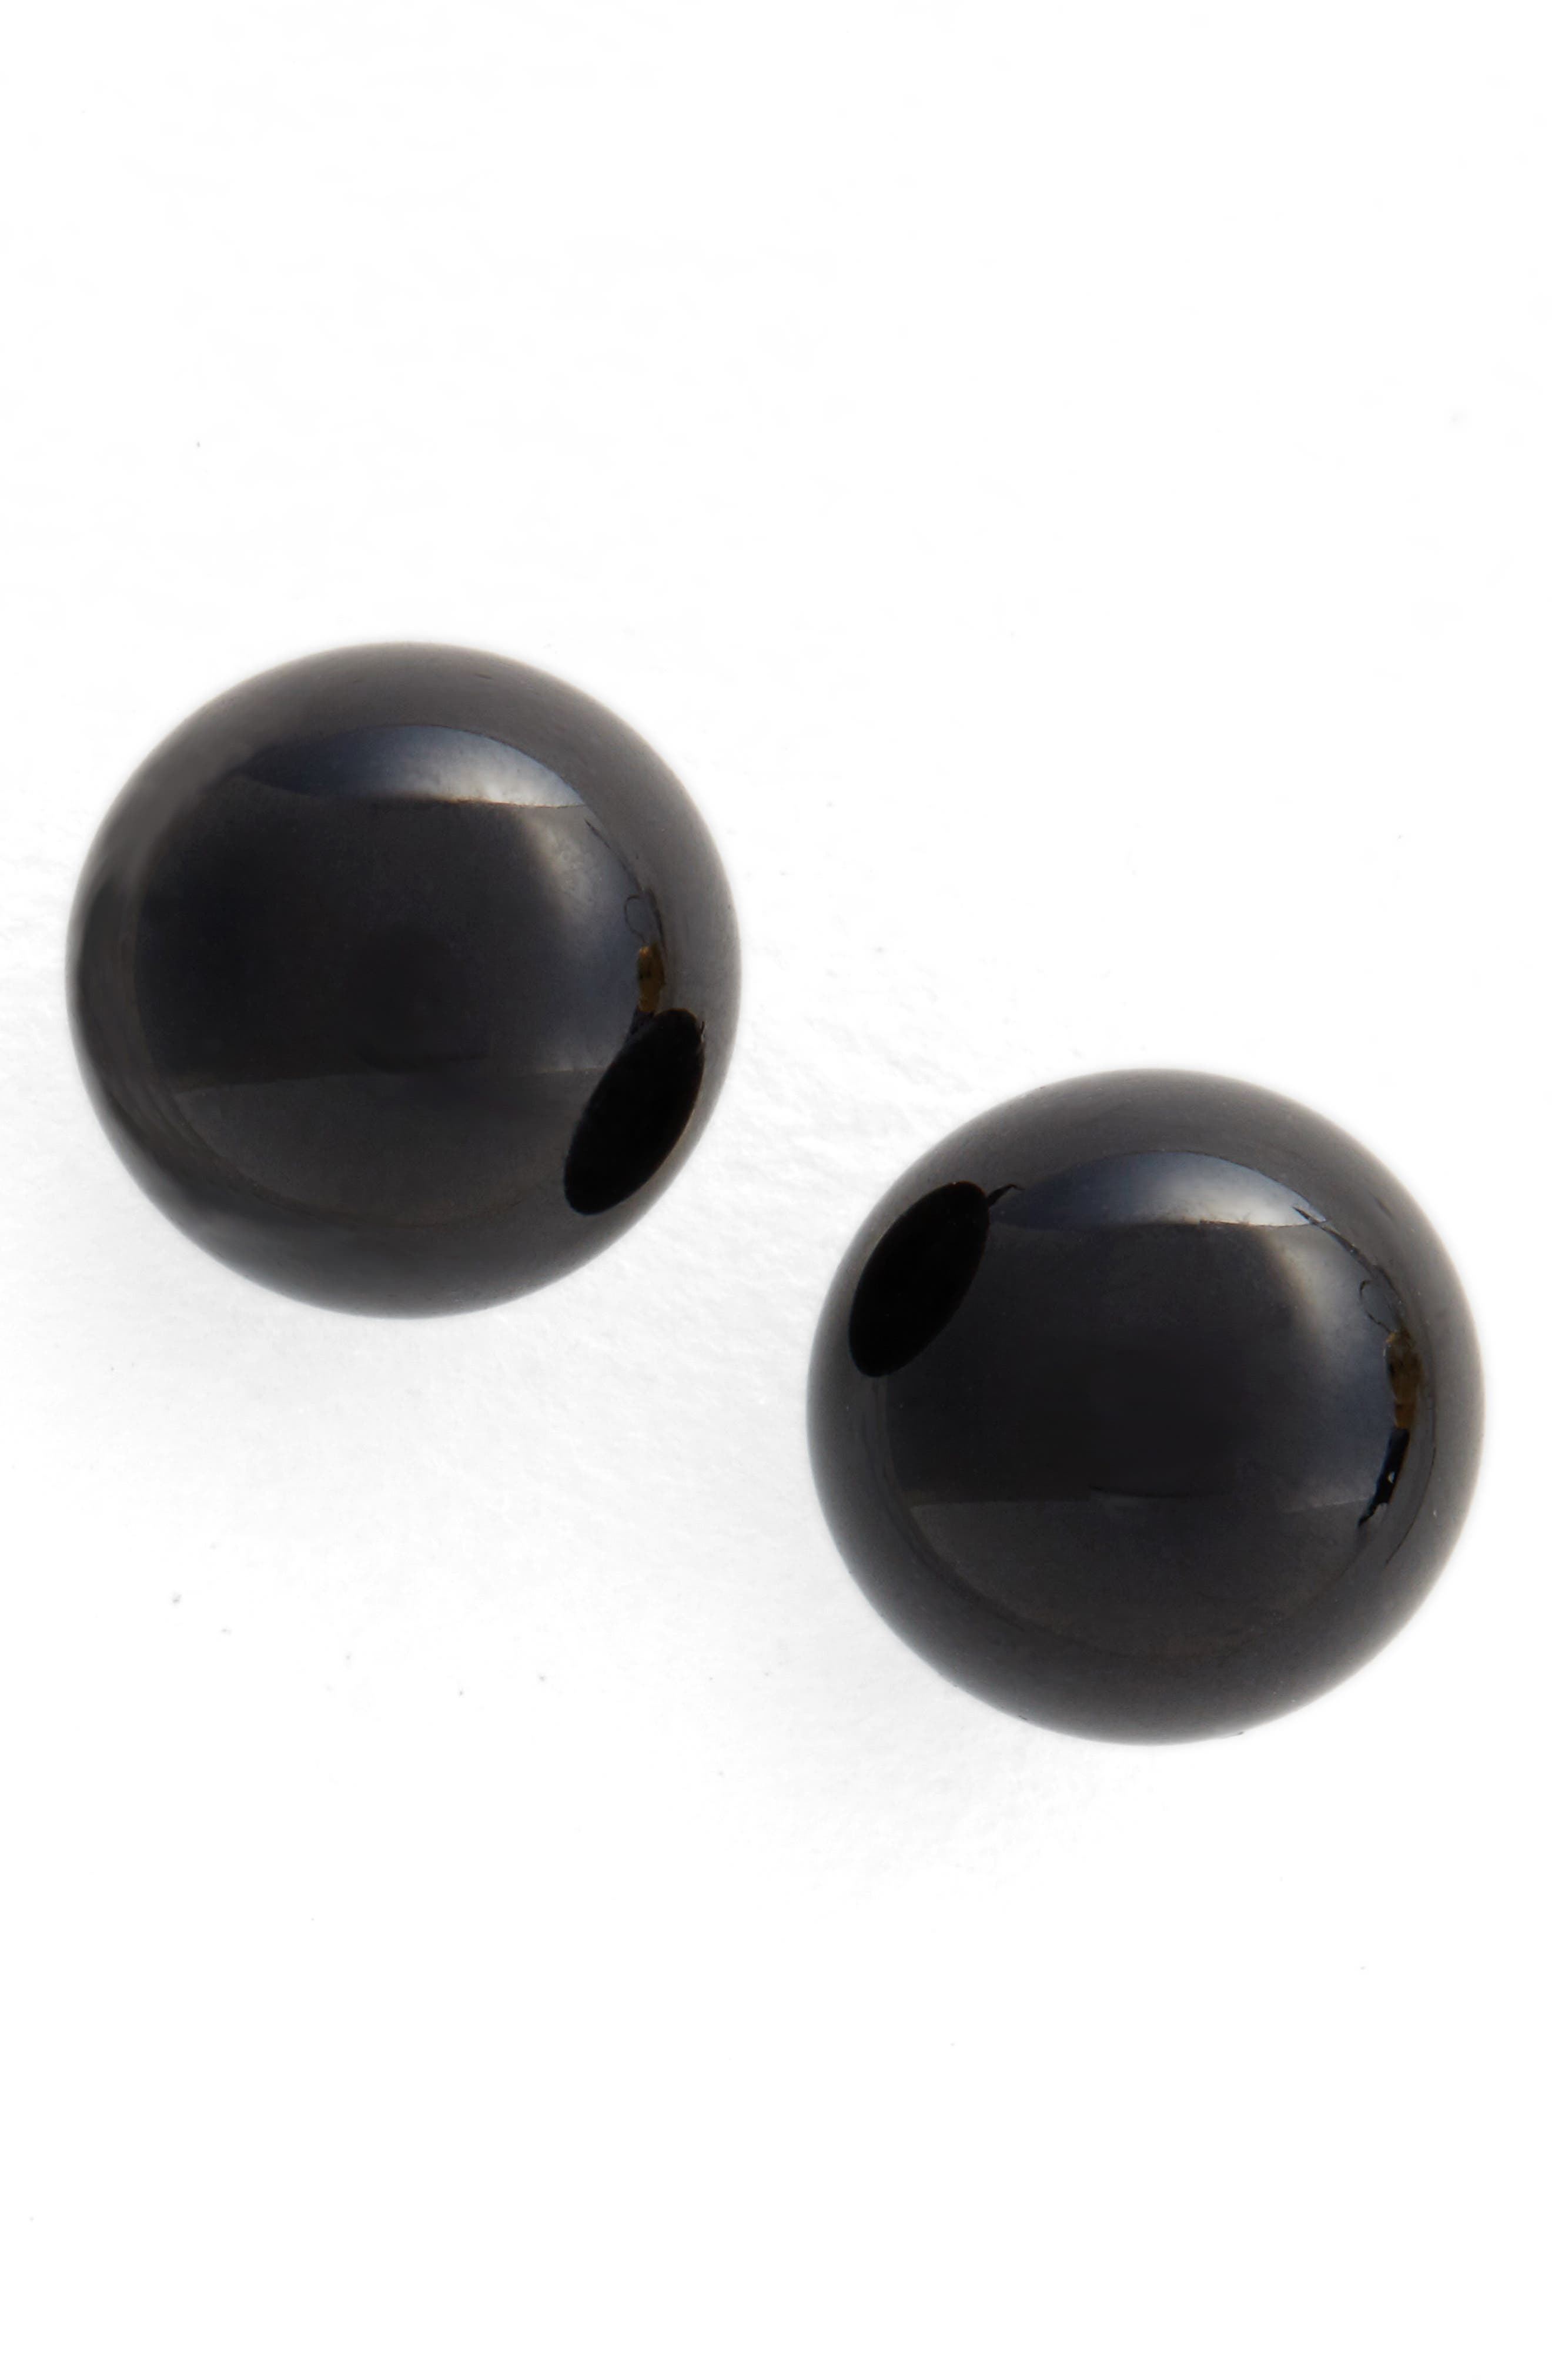 Onyx Sphere Stud Earrings,                             Main thumbnail 1, color,                             041